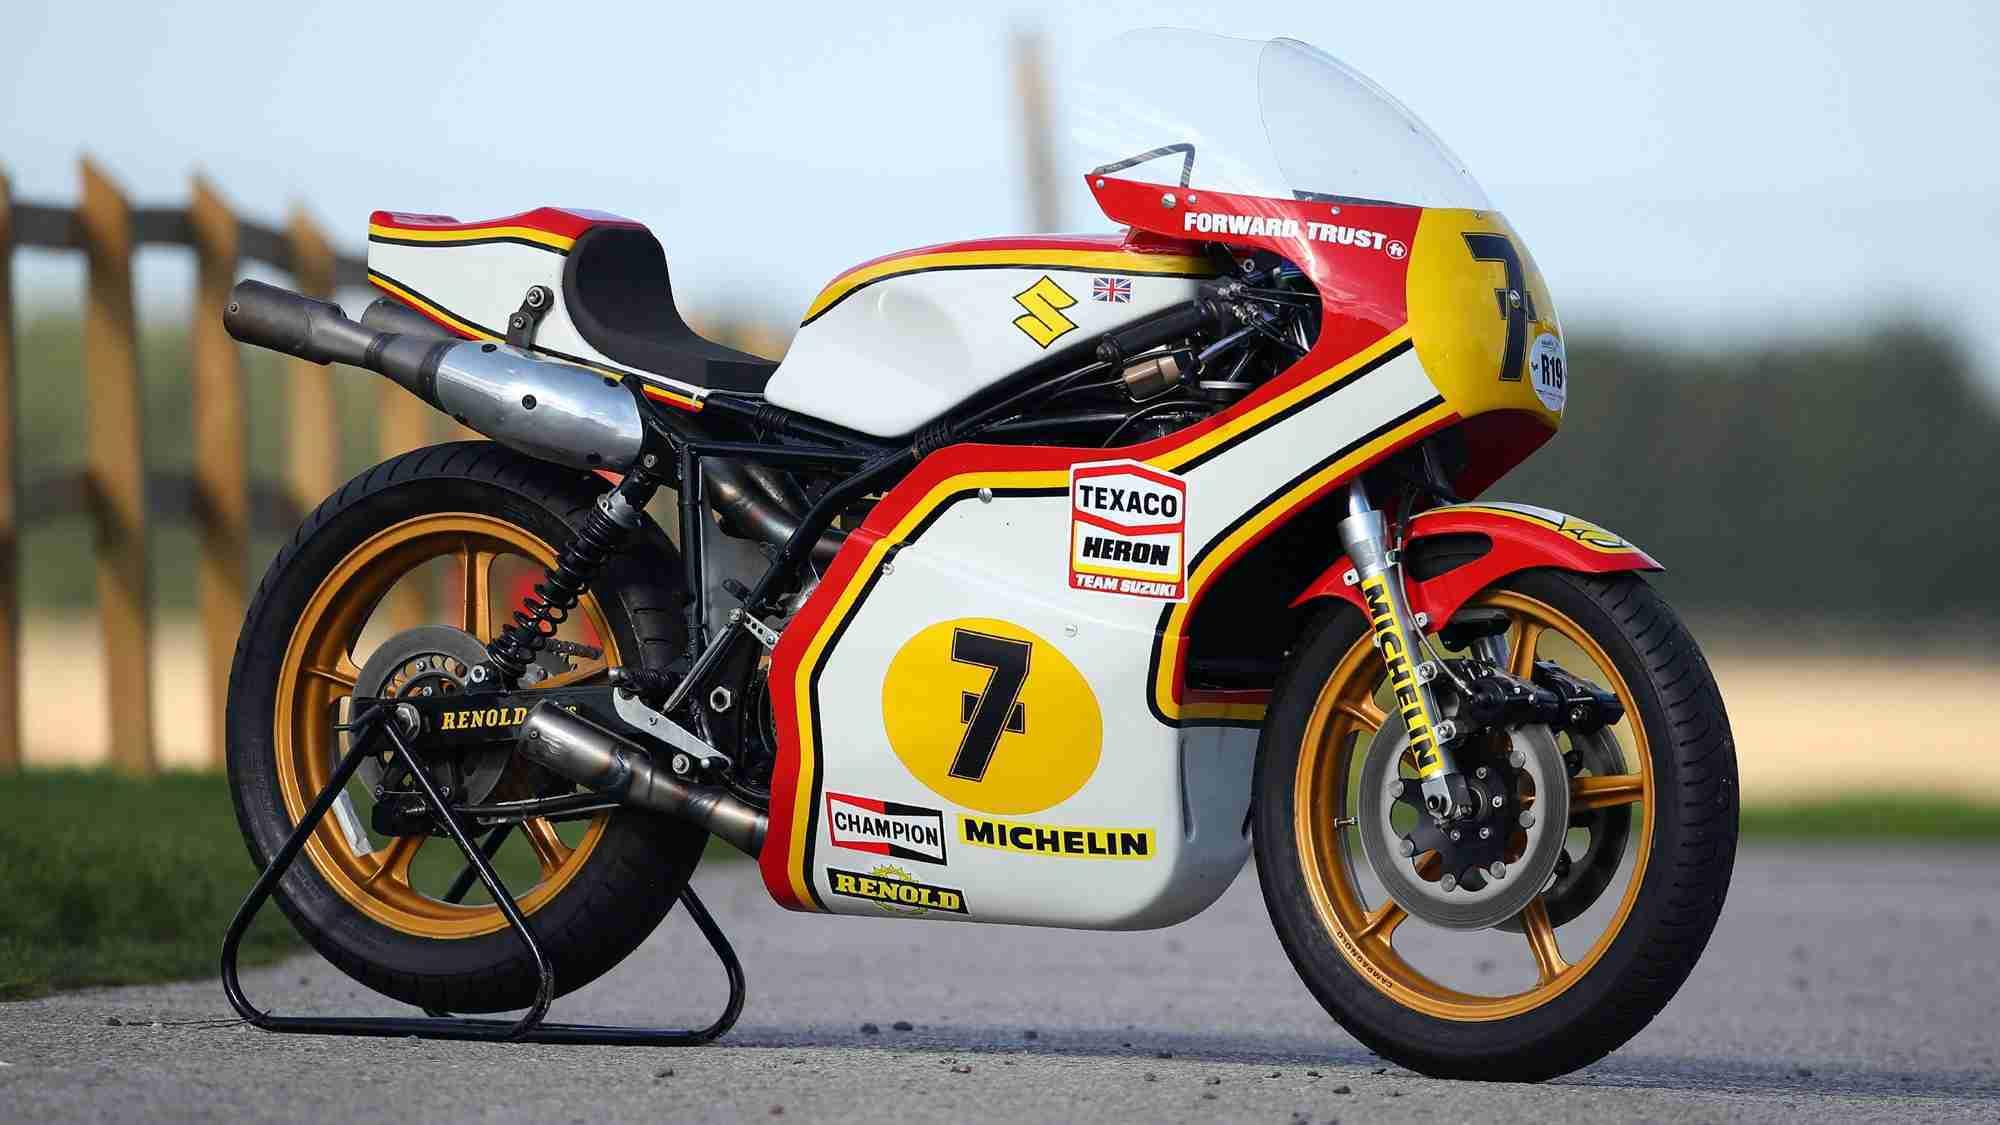 Barry Sheene's race bikes